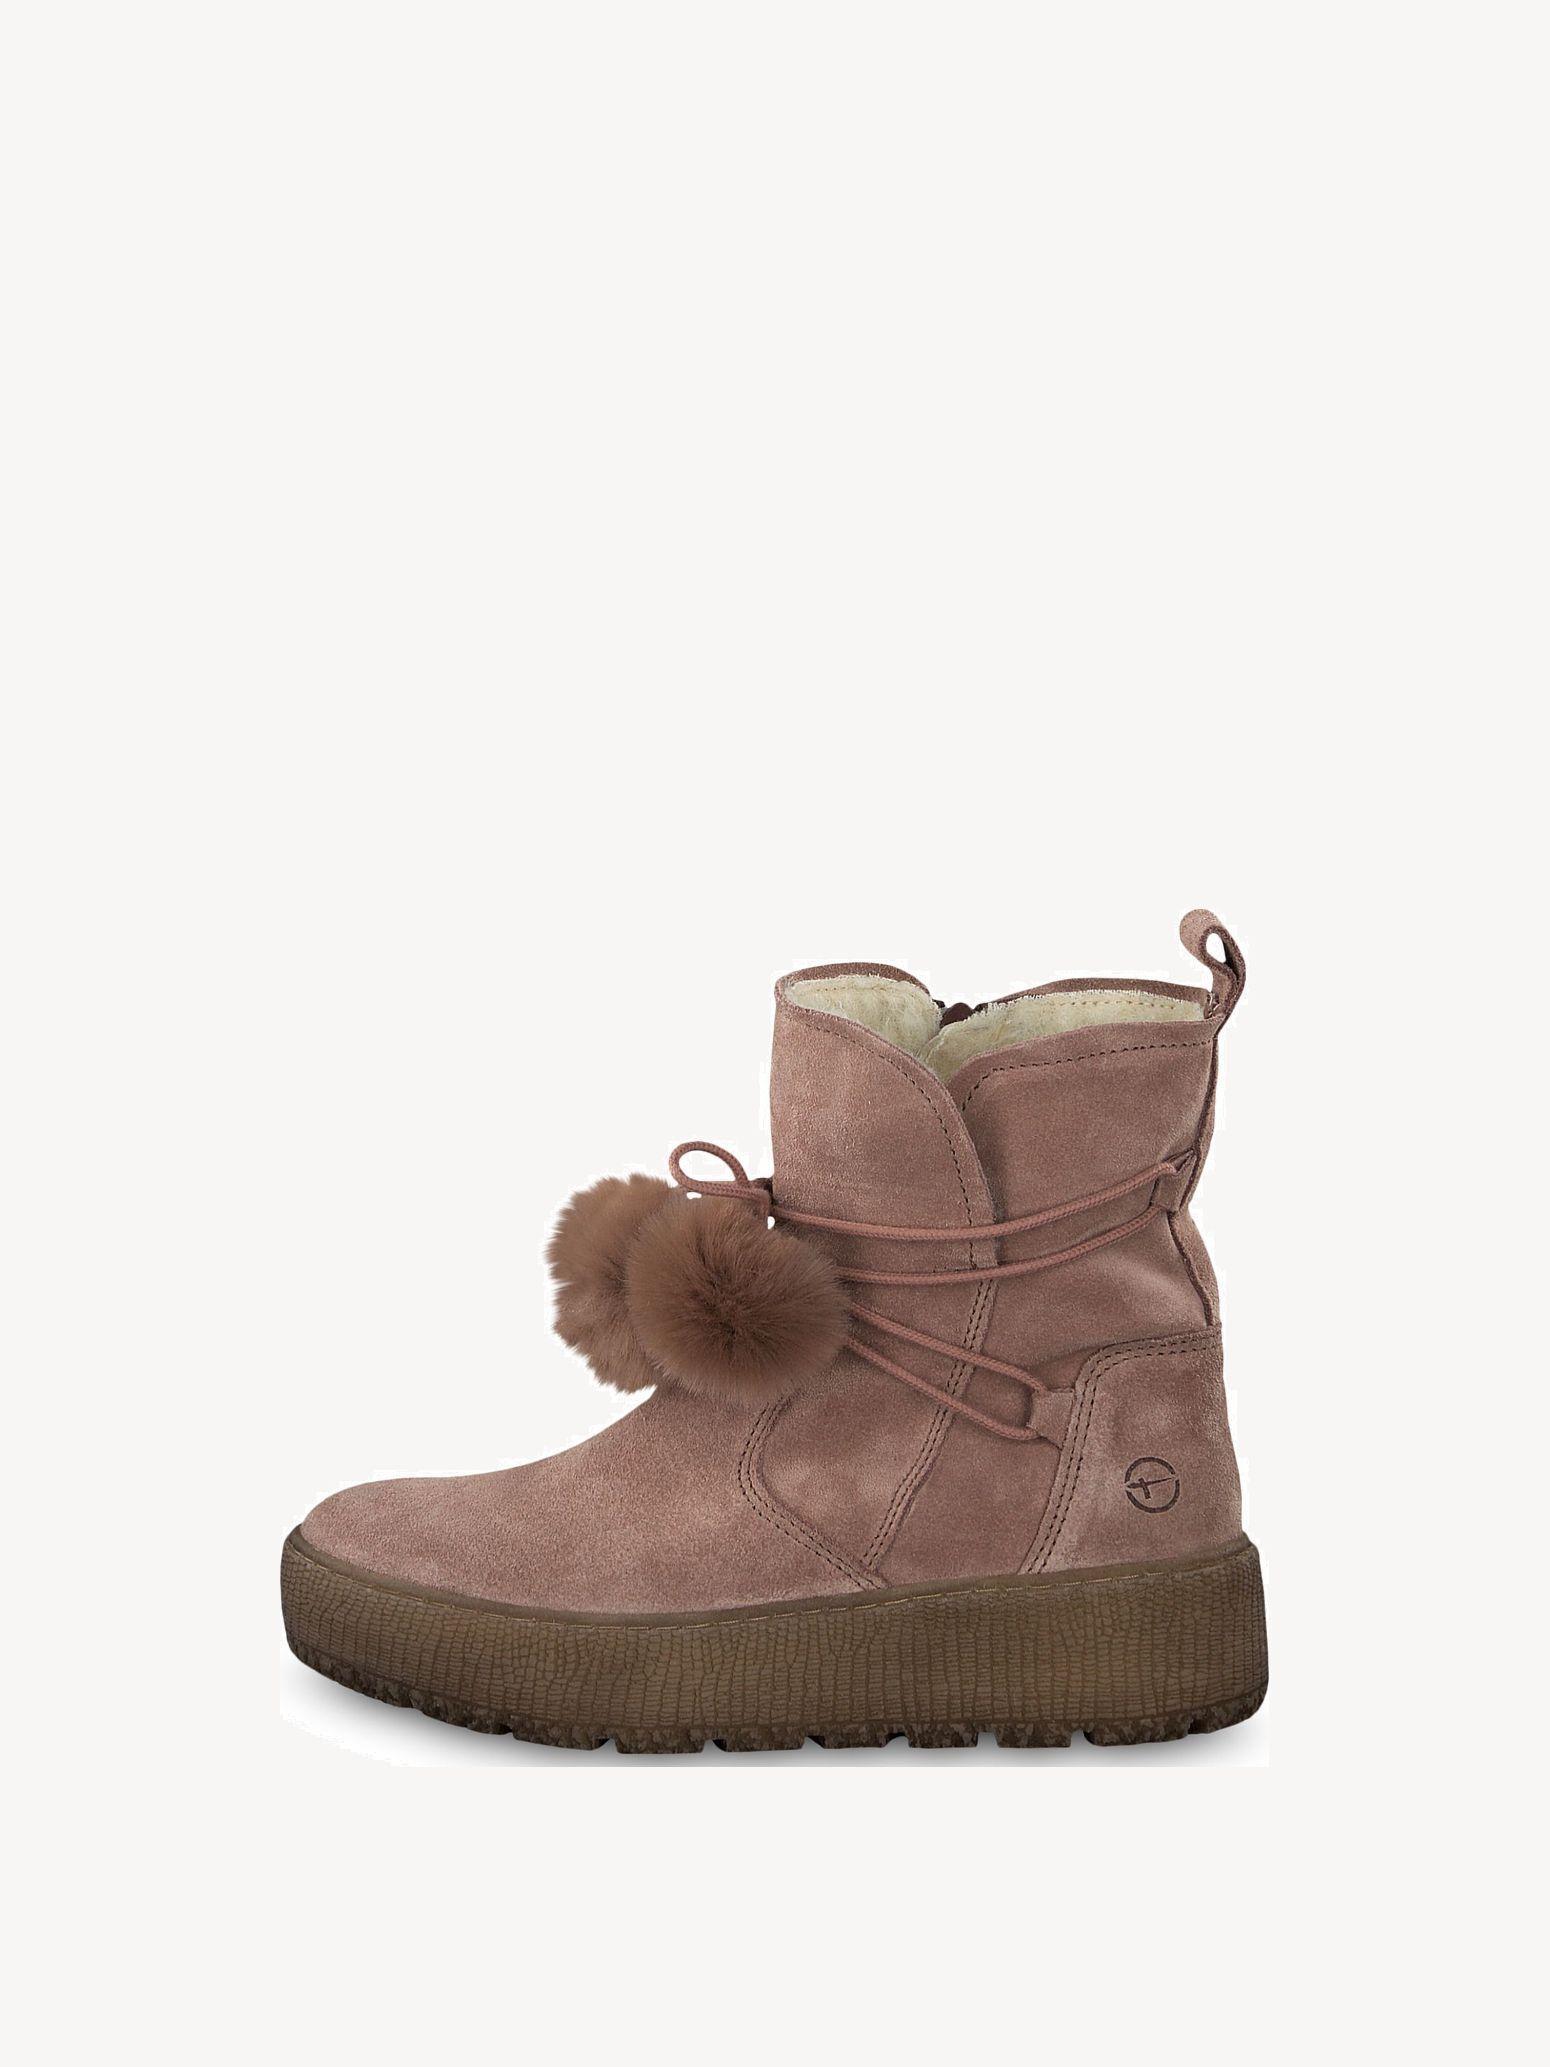 Tamaris Damen Schuhe Hamburg Outlet Kaufen 100